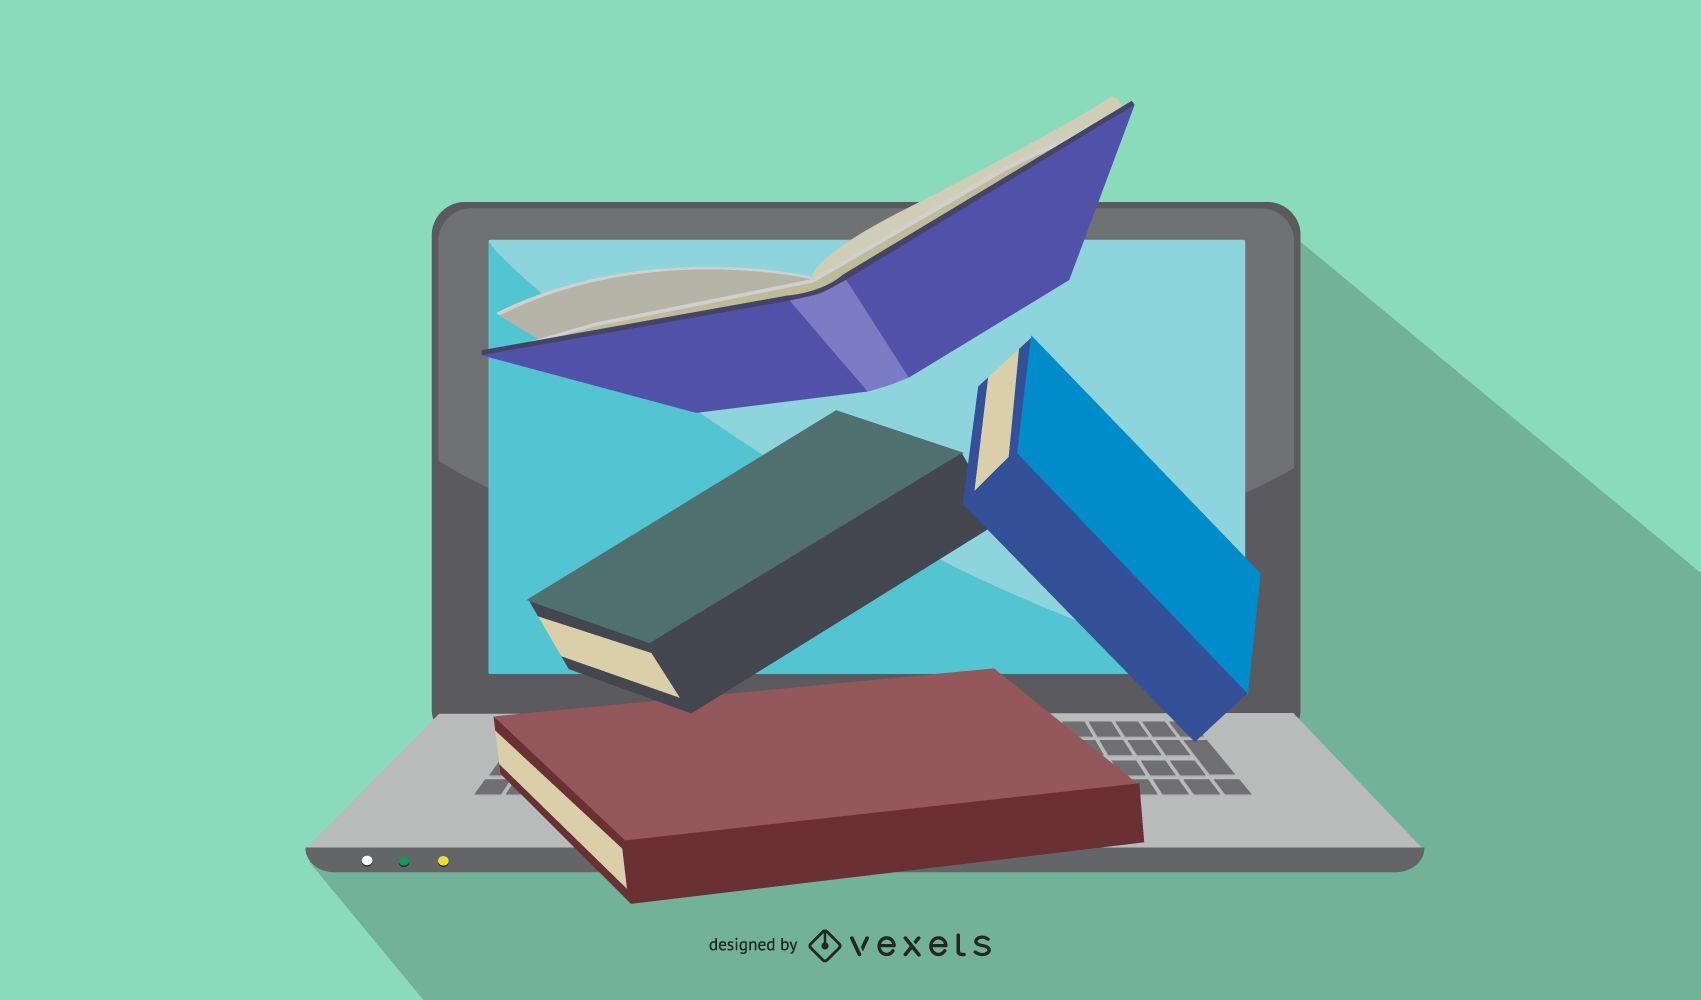 Books Floating on Opened Laptop